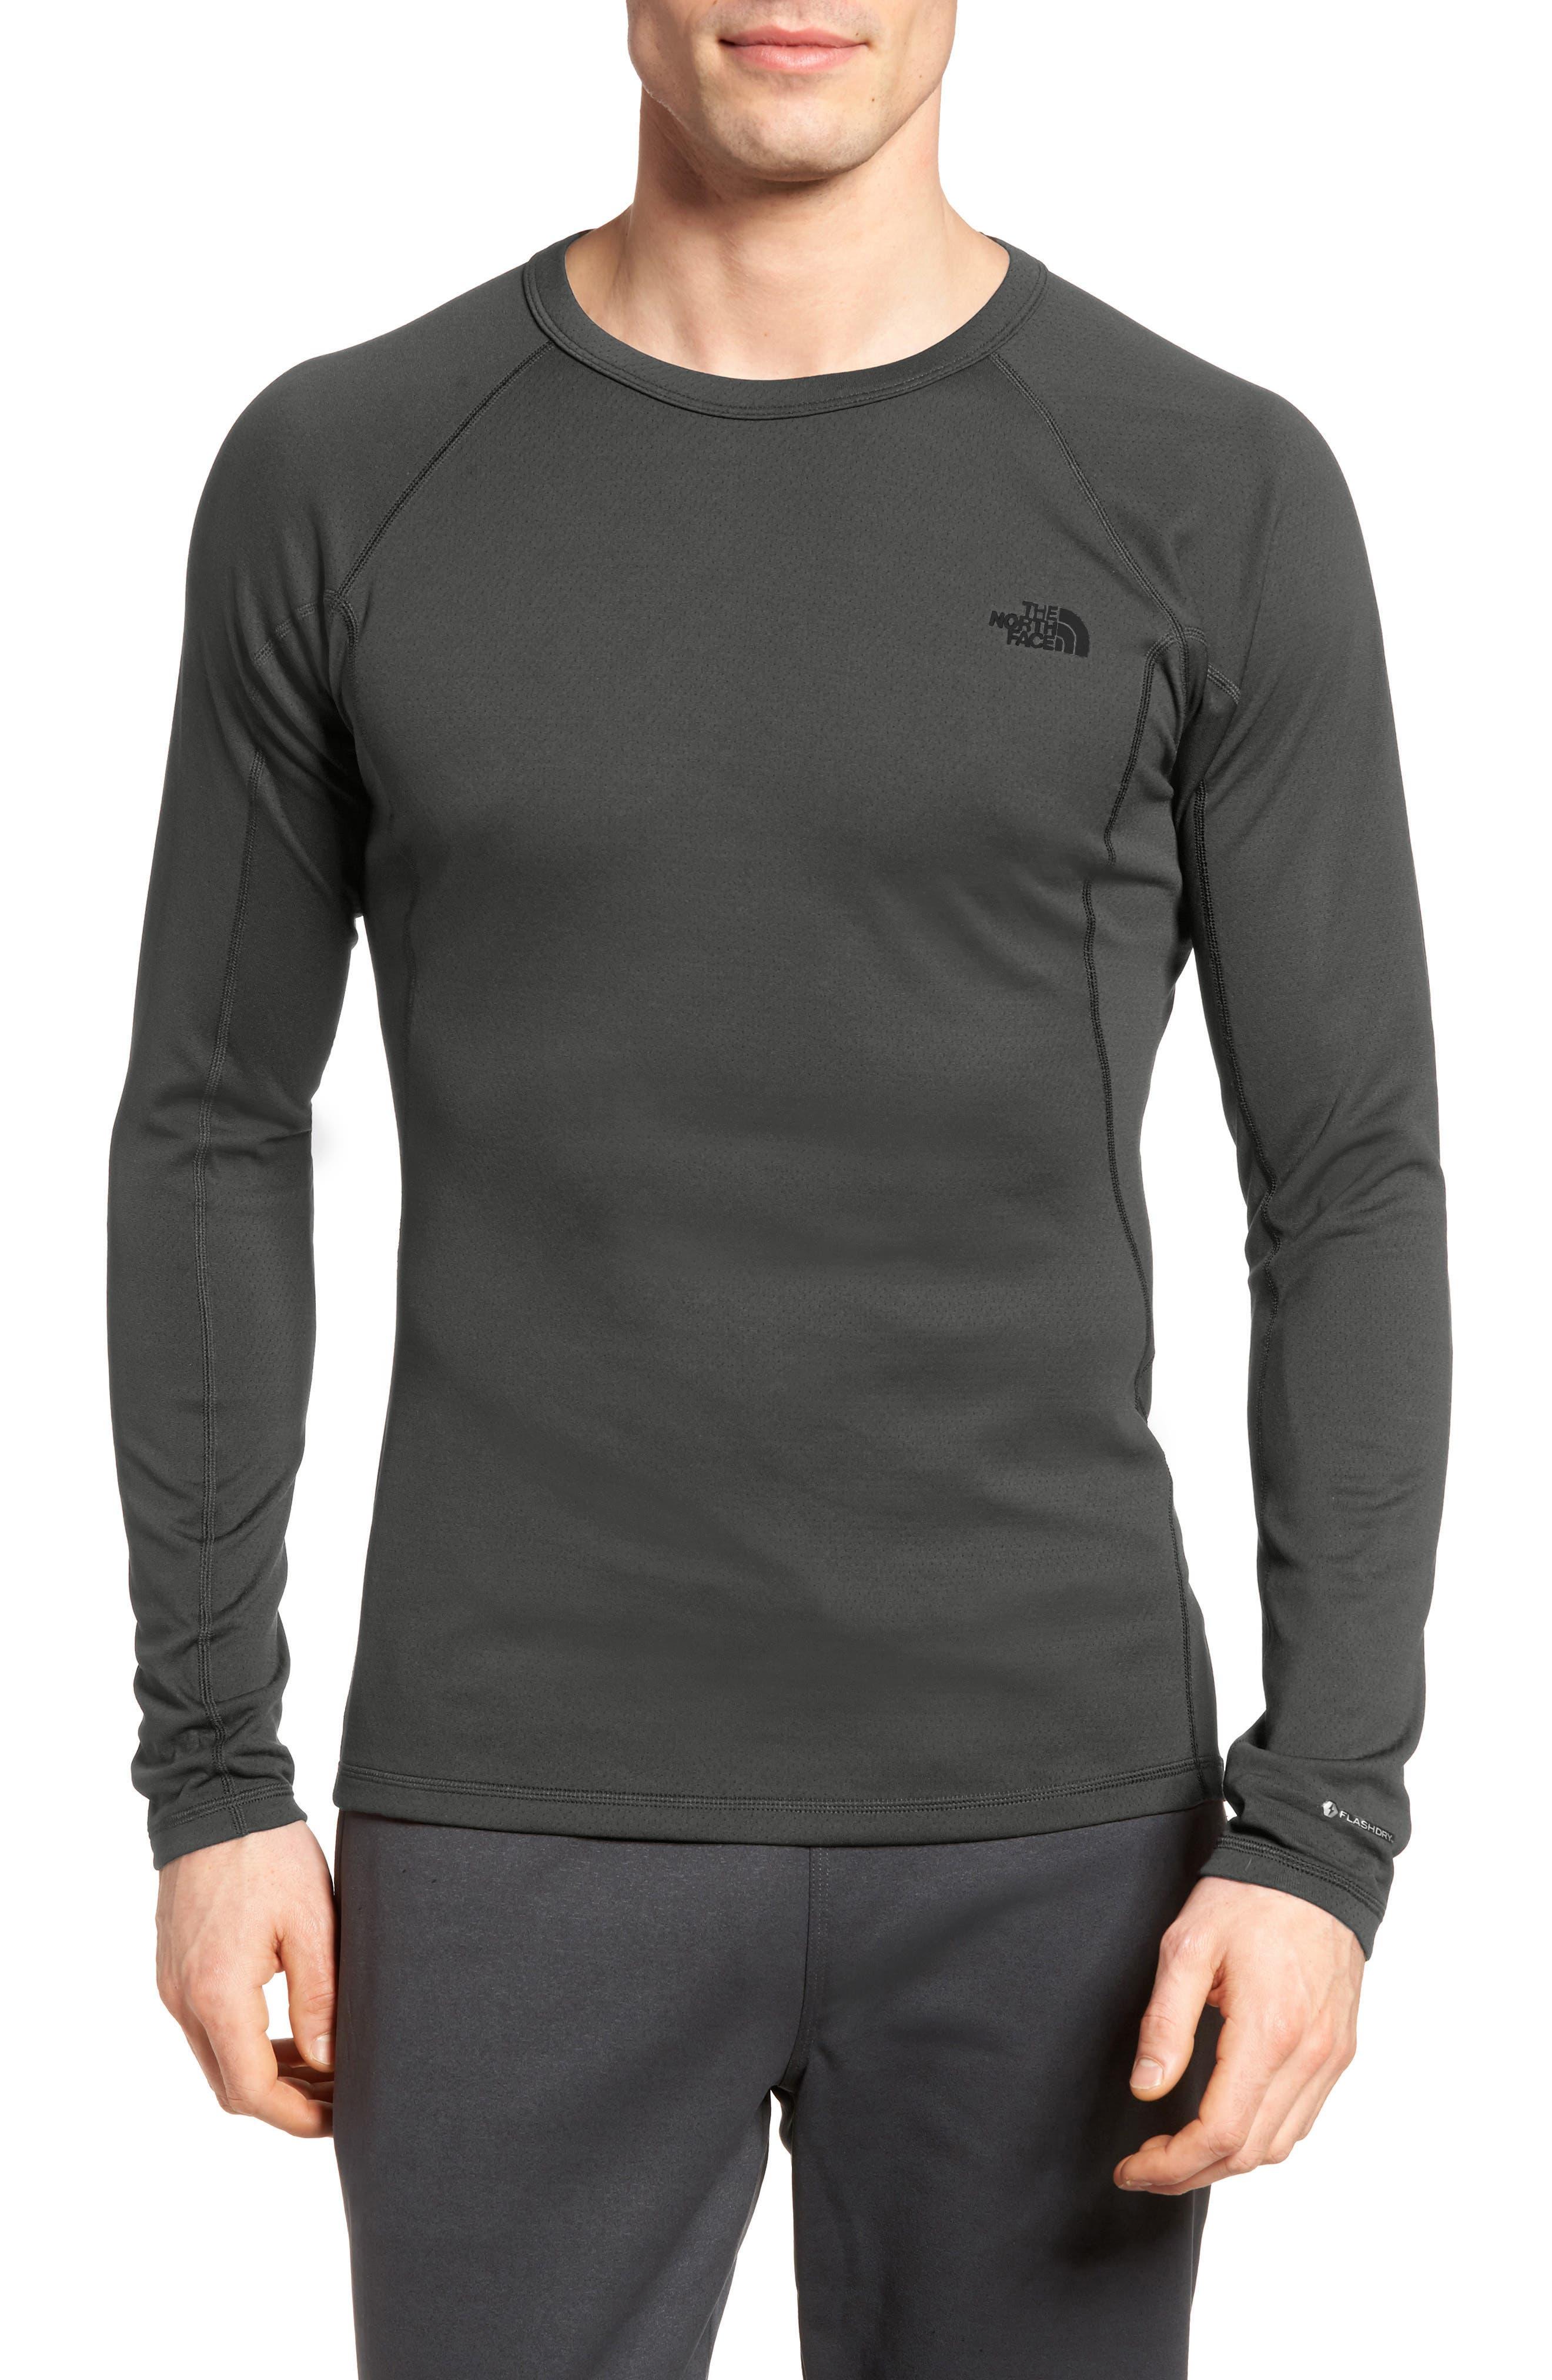 The North Face Warm Long Sleeve Shirt